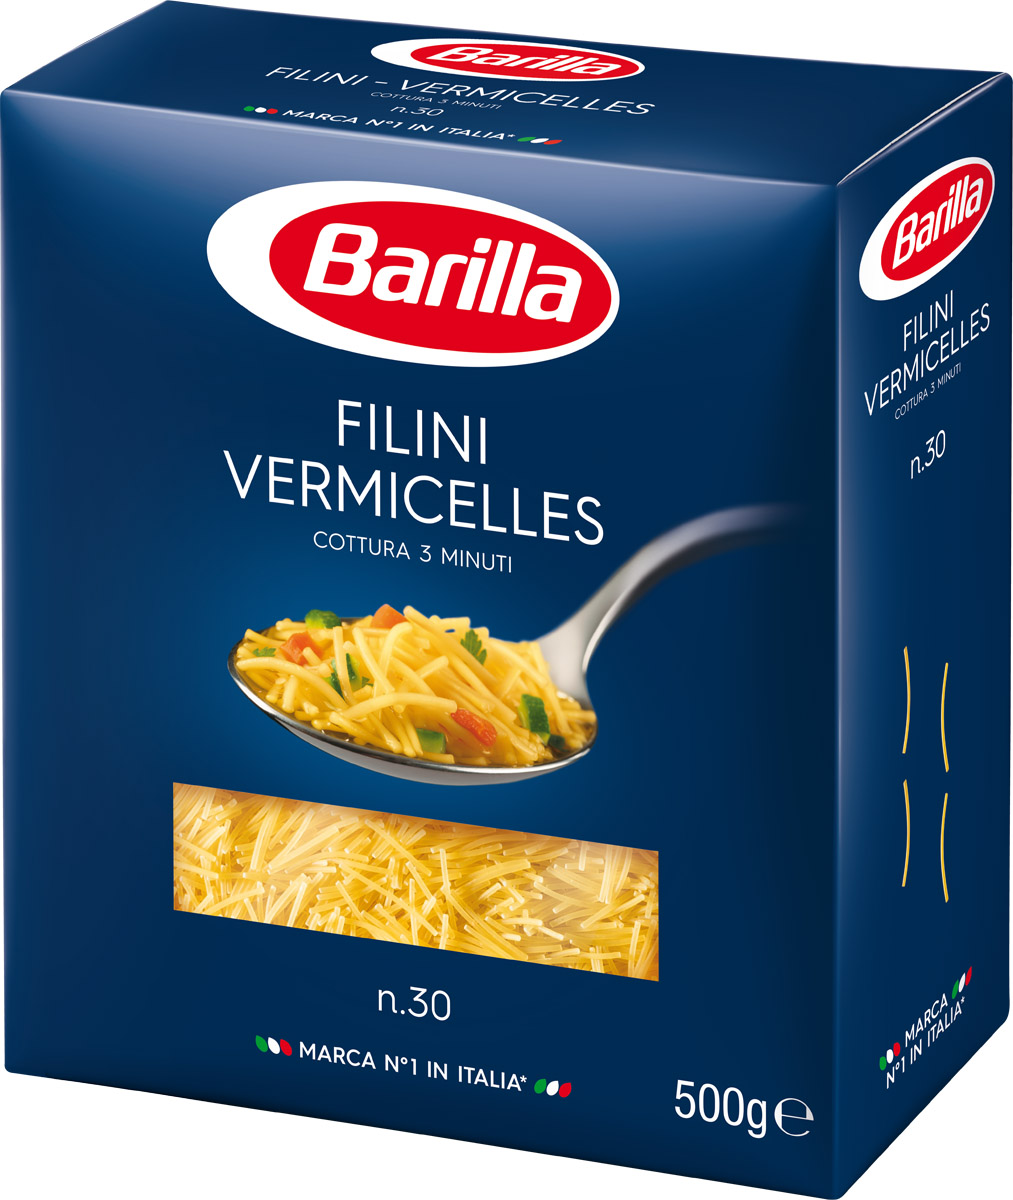 Barilla Filini филини паста, 500 г barilla spaghettini паста спагеттини 500 г